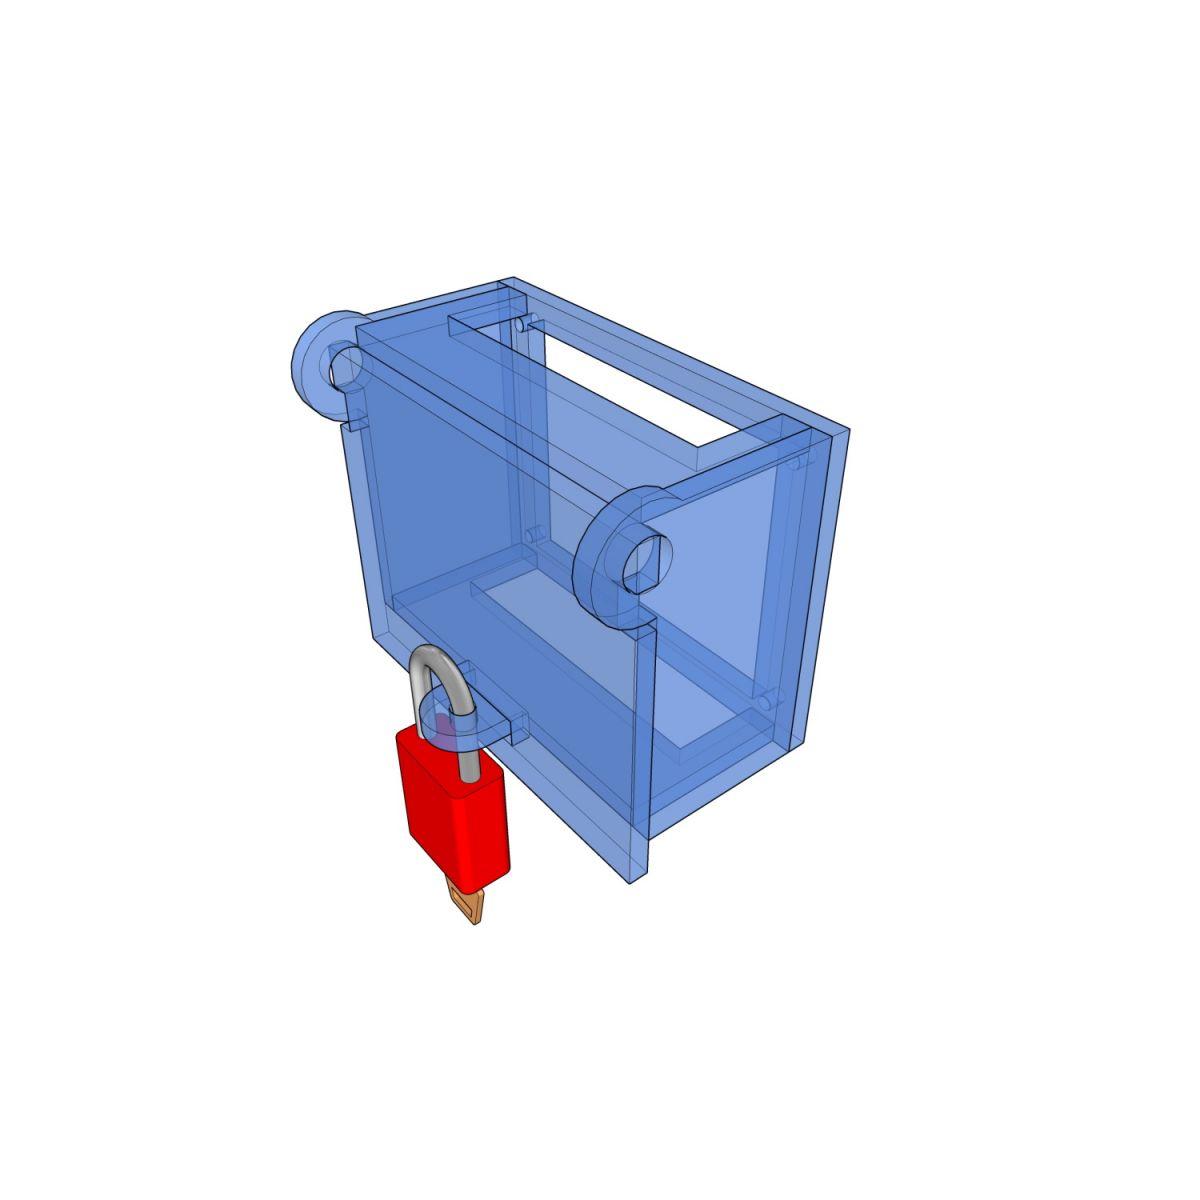 Postes de cadenassage en polycarbonate | BLC-BOR-OUV ES8812